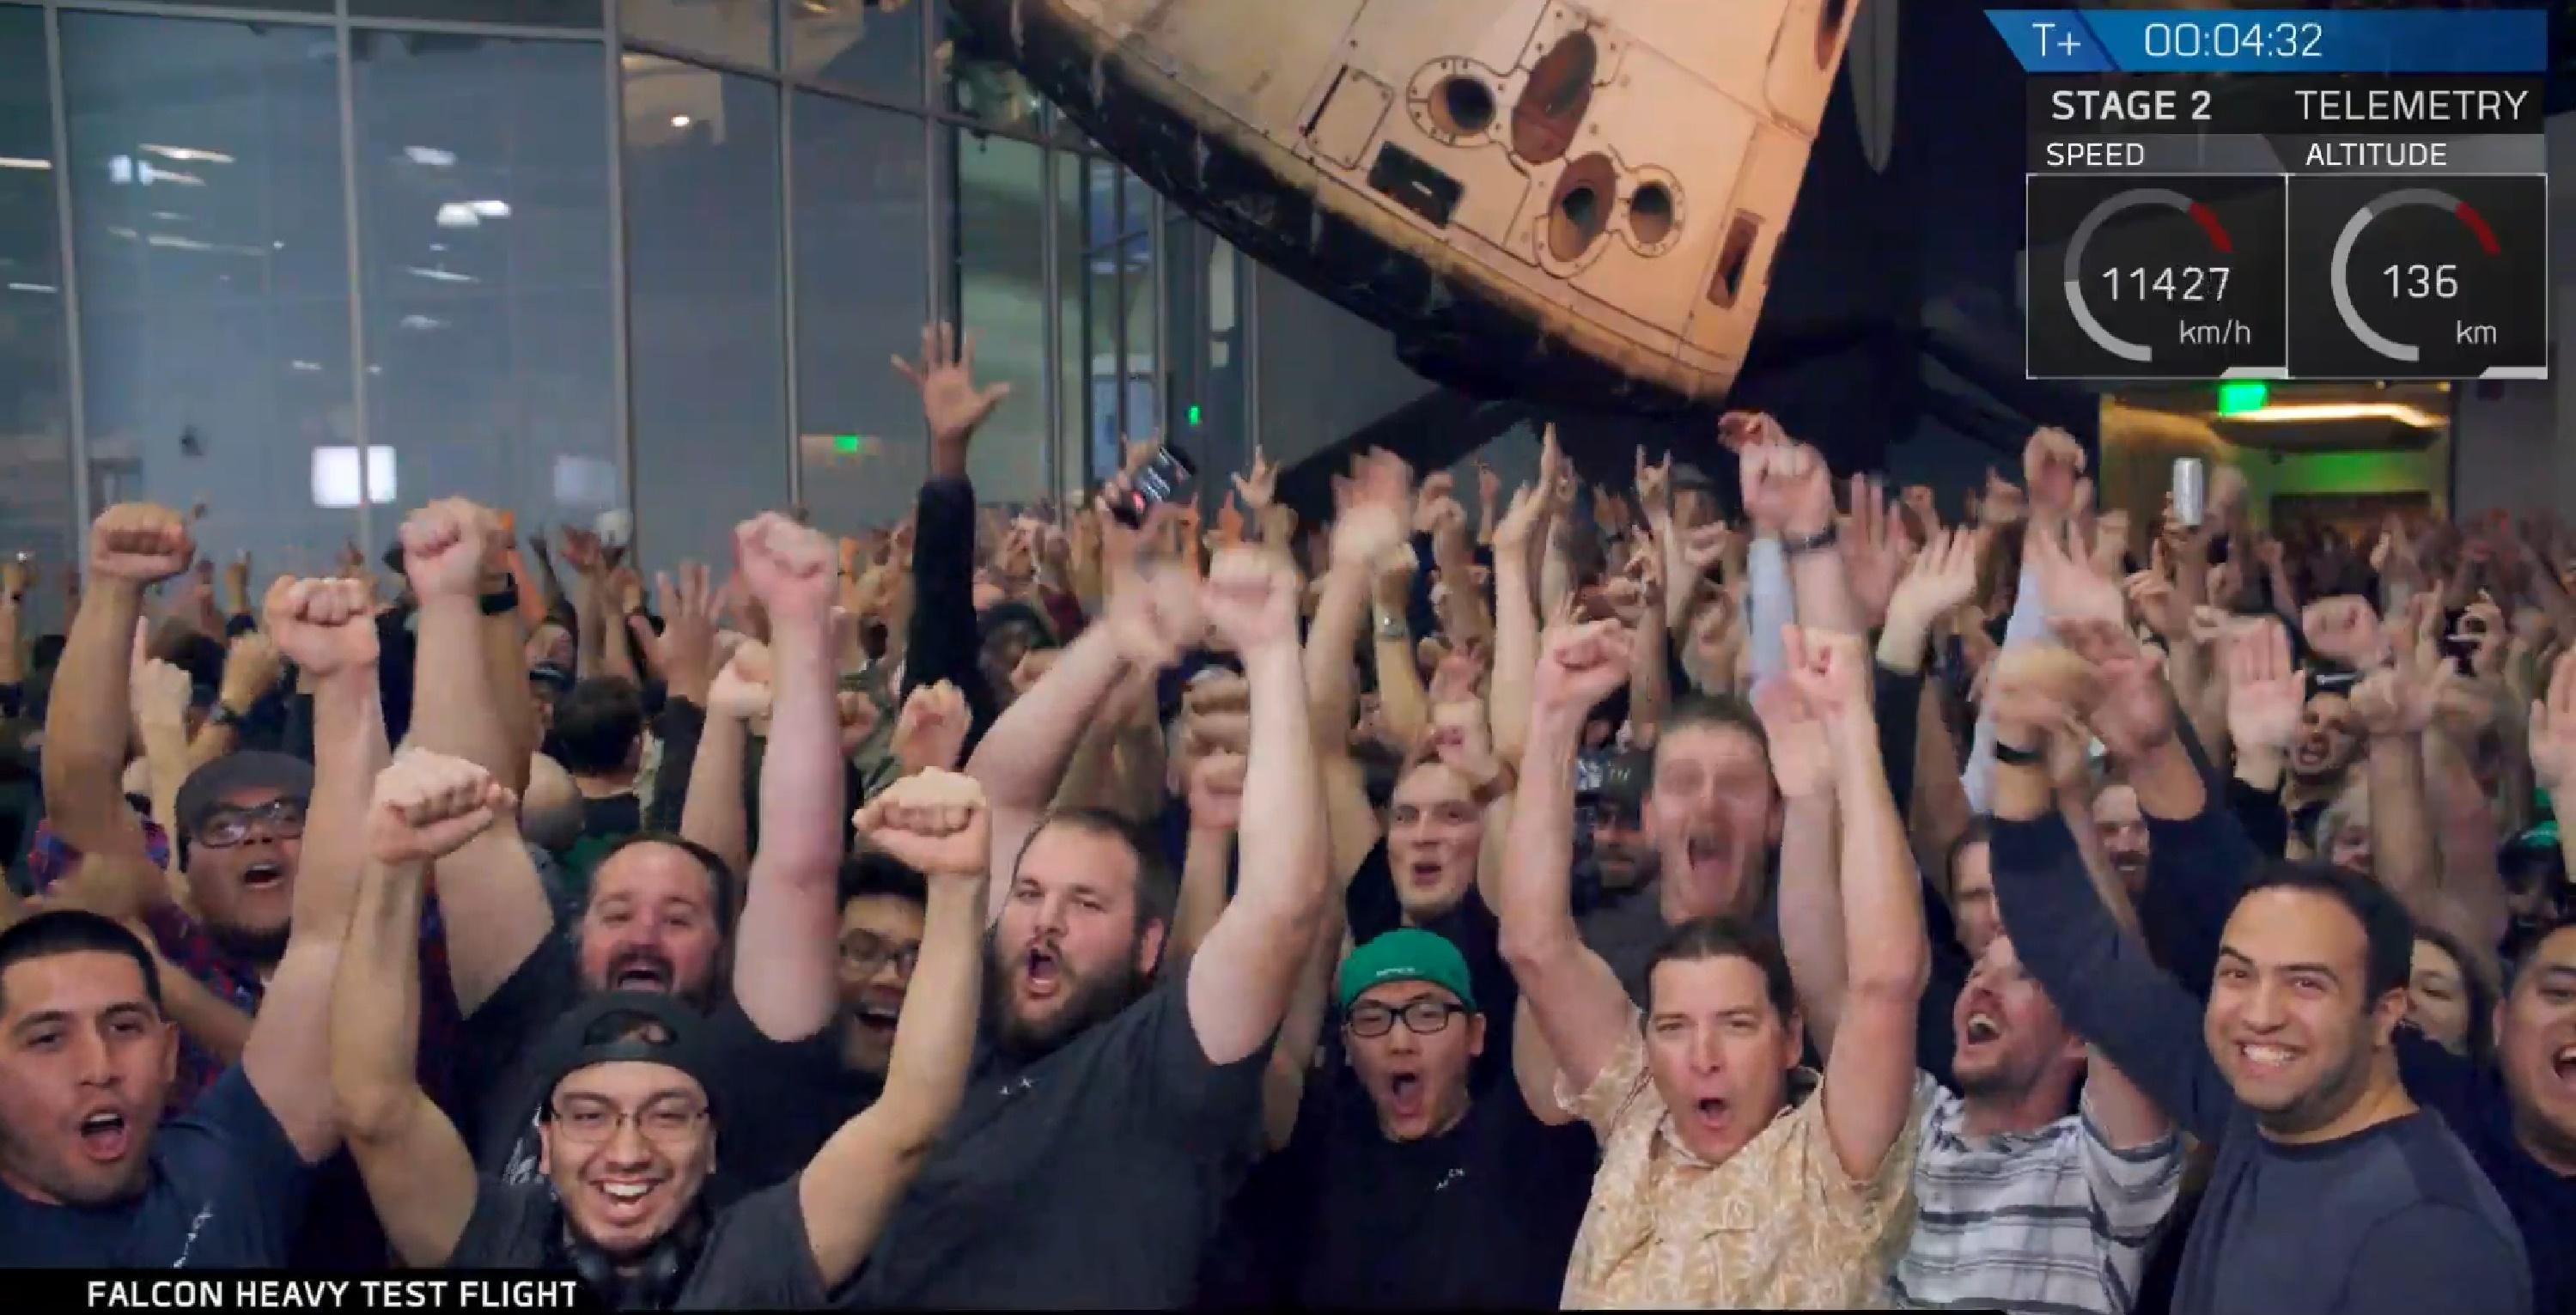 FH celebration (SpaceX)